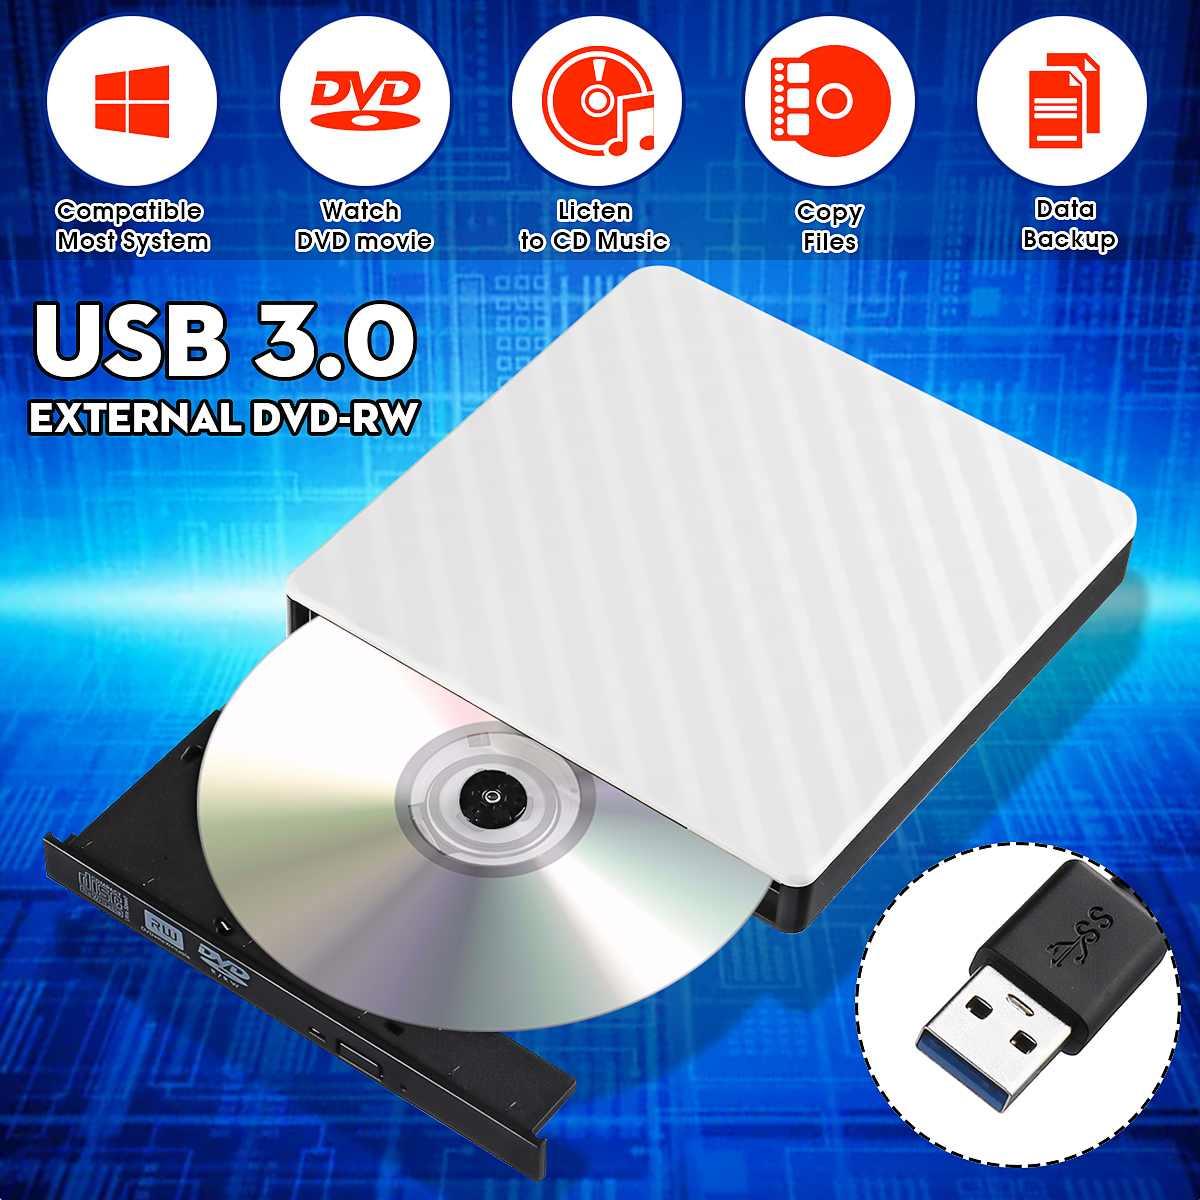 External USB 3.0 DVD RW CD Writer Slim Carbon Grain Drive Burner Reader Player For PC Laptop Optical Drive